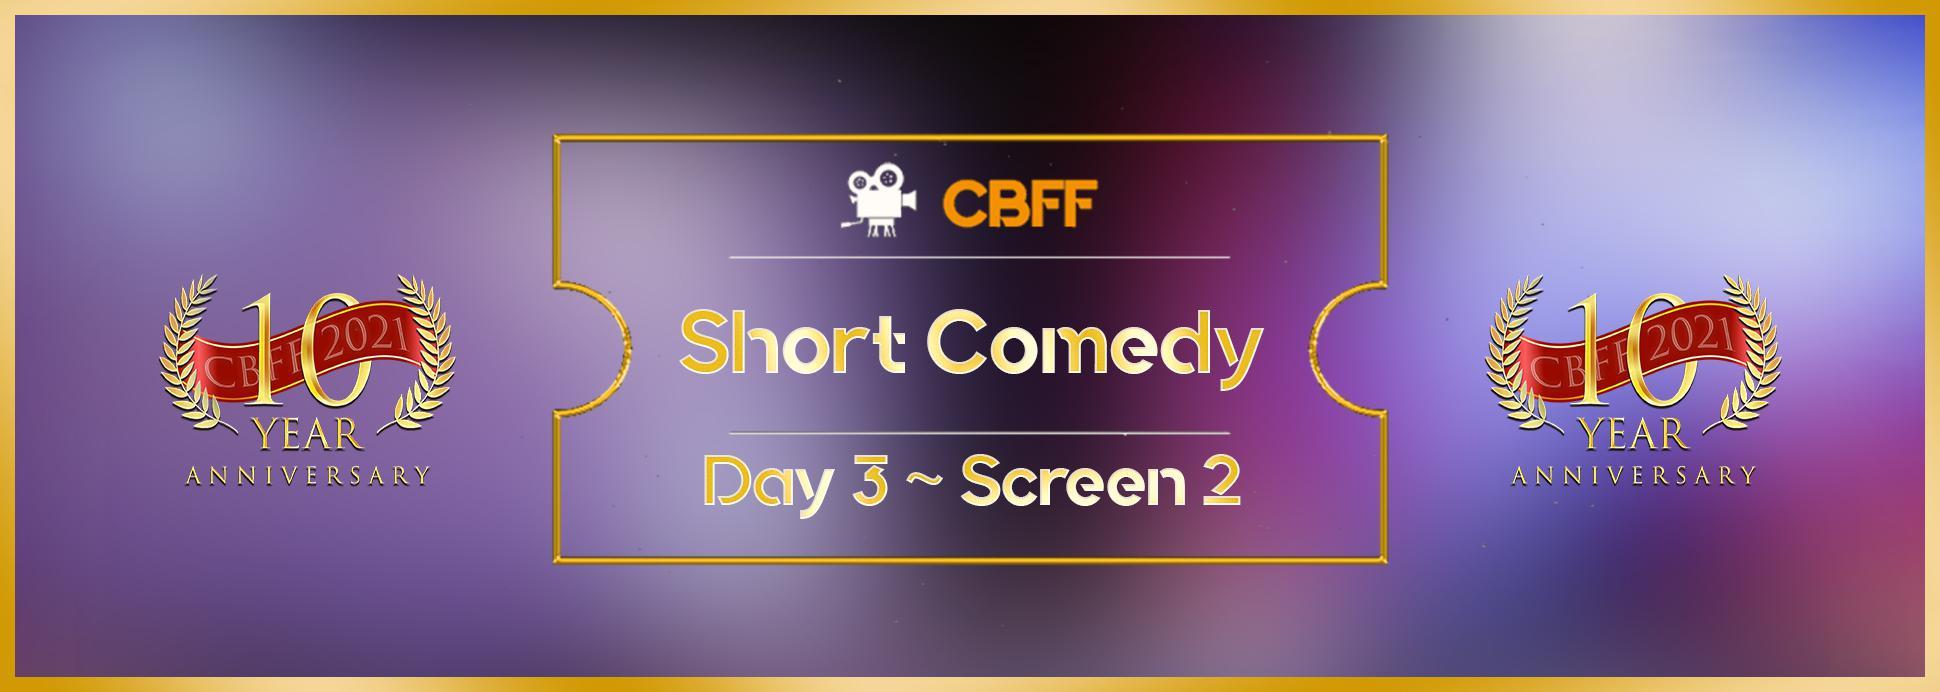 Day 3, Screen 2: Short Comedy